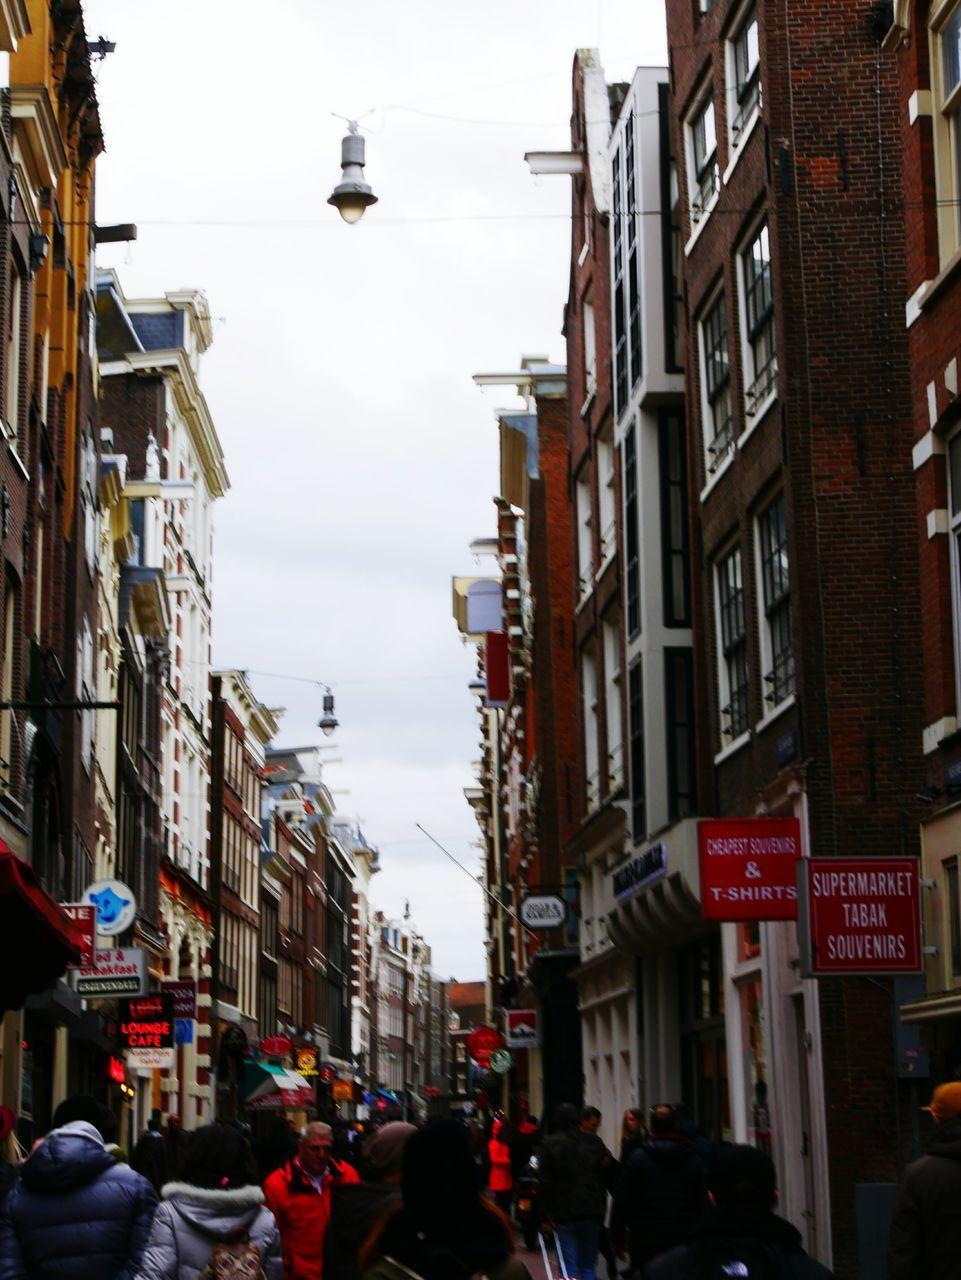 Crowd On City Street Amidst Buildings Against Sky